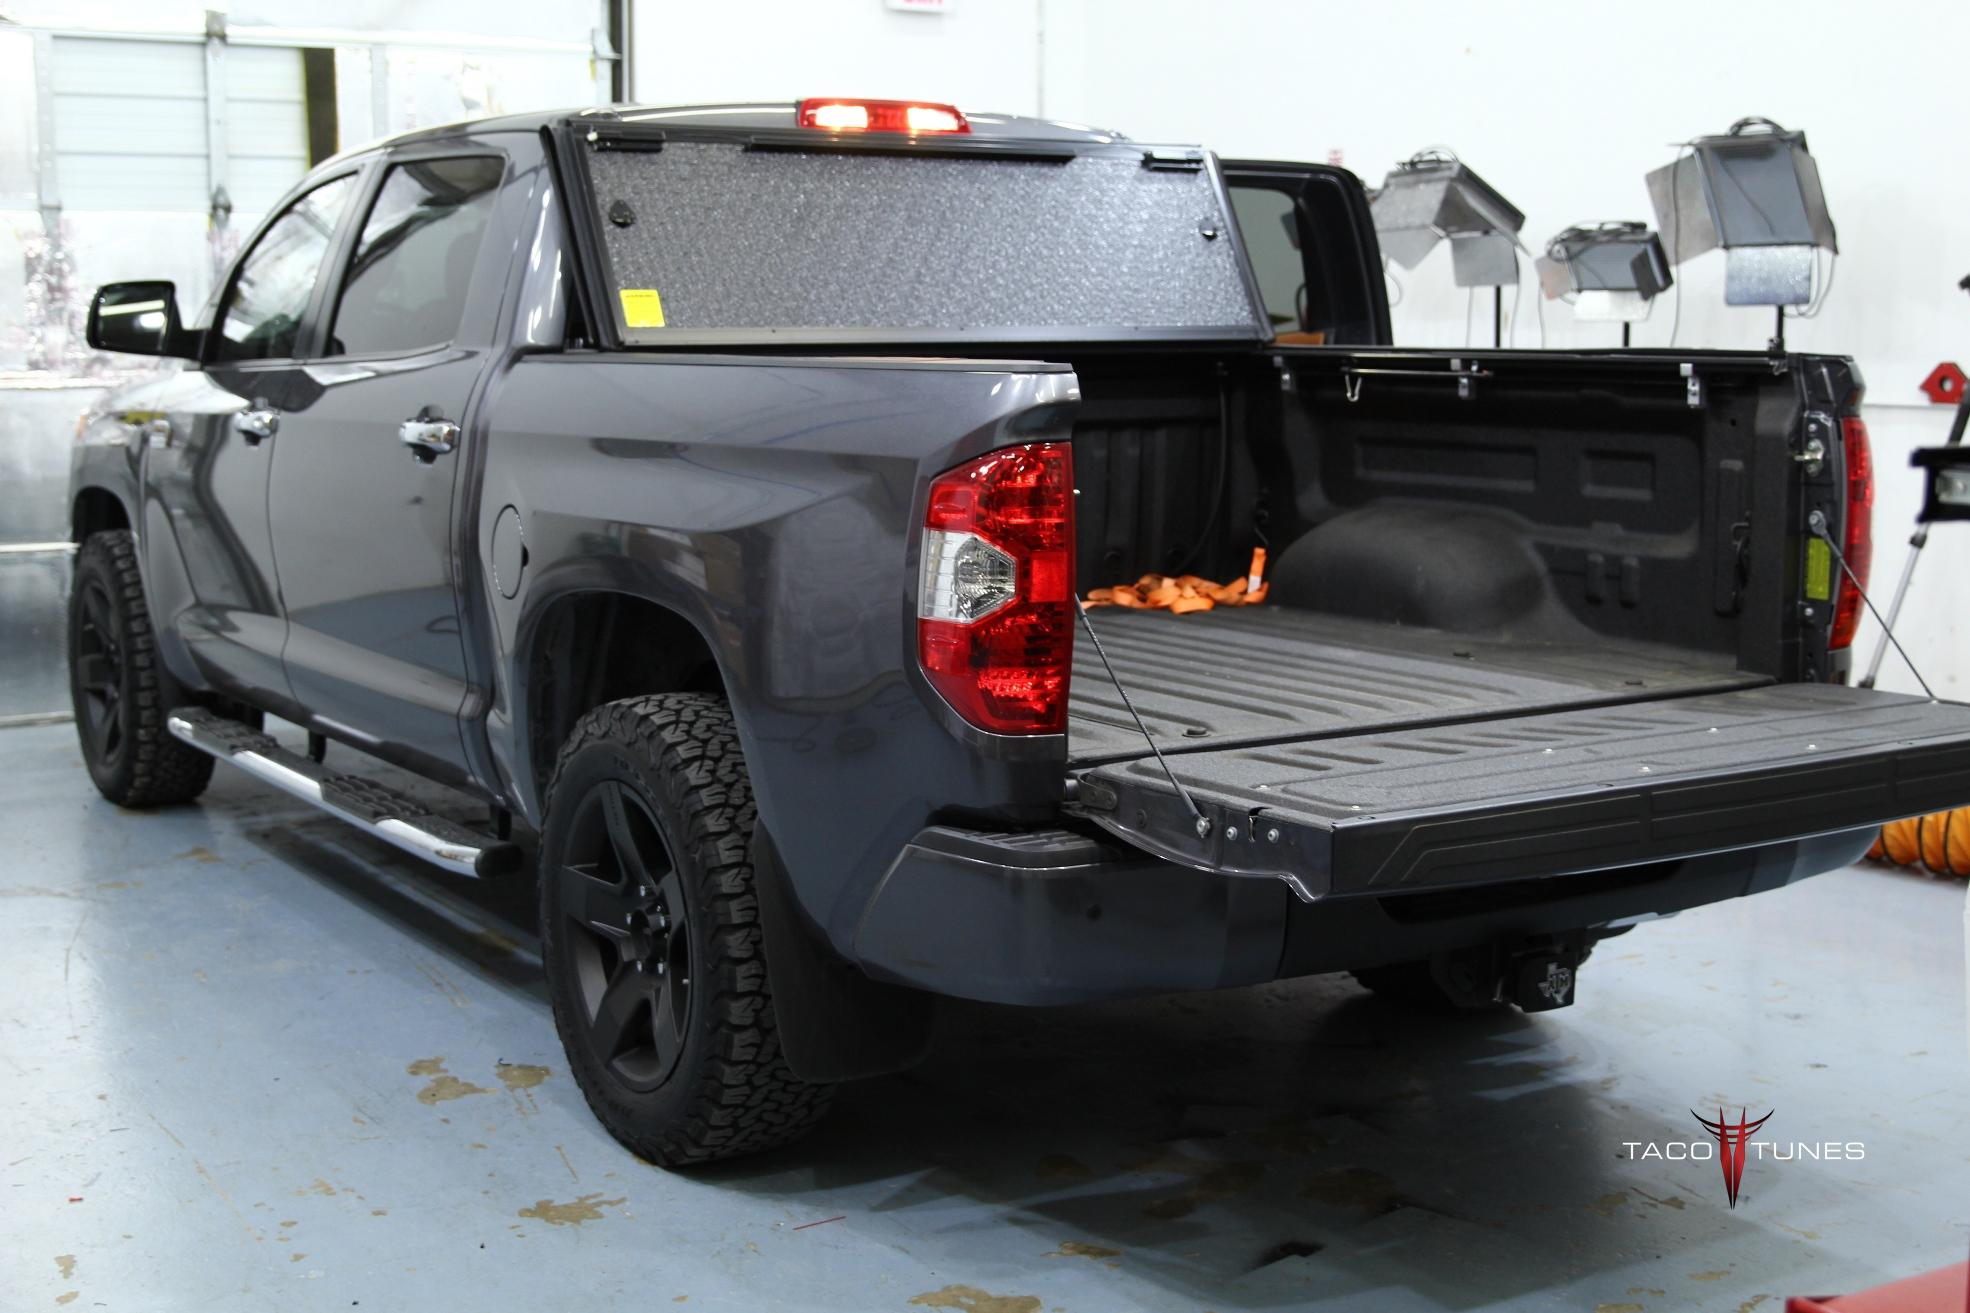 Used Cars San Antonio Tx Craigslist - New Upcoming Cars ...